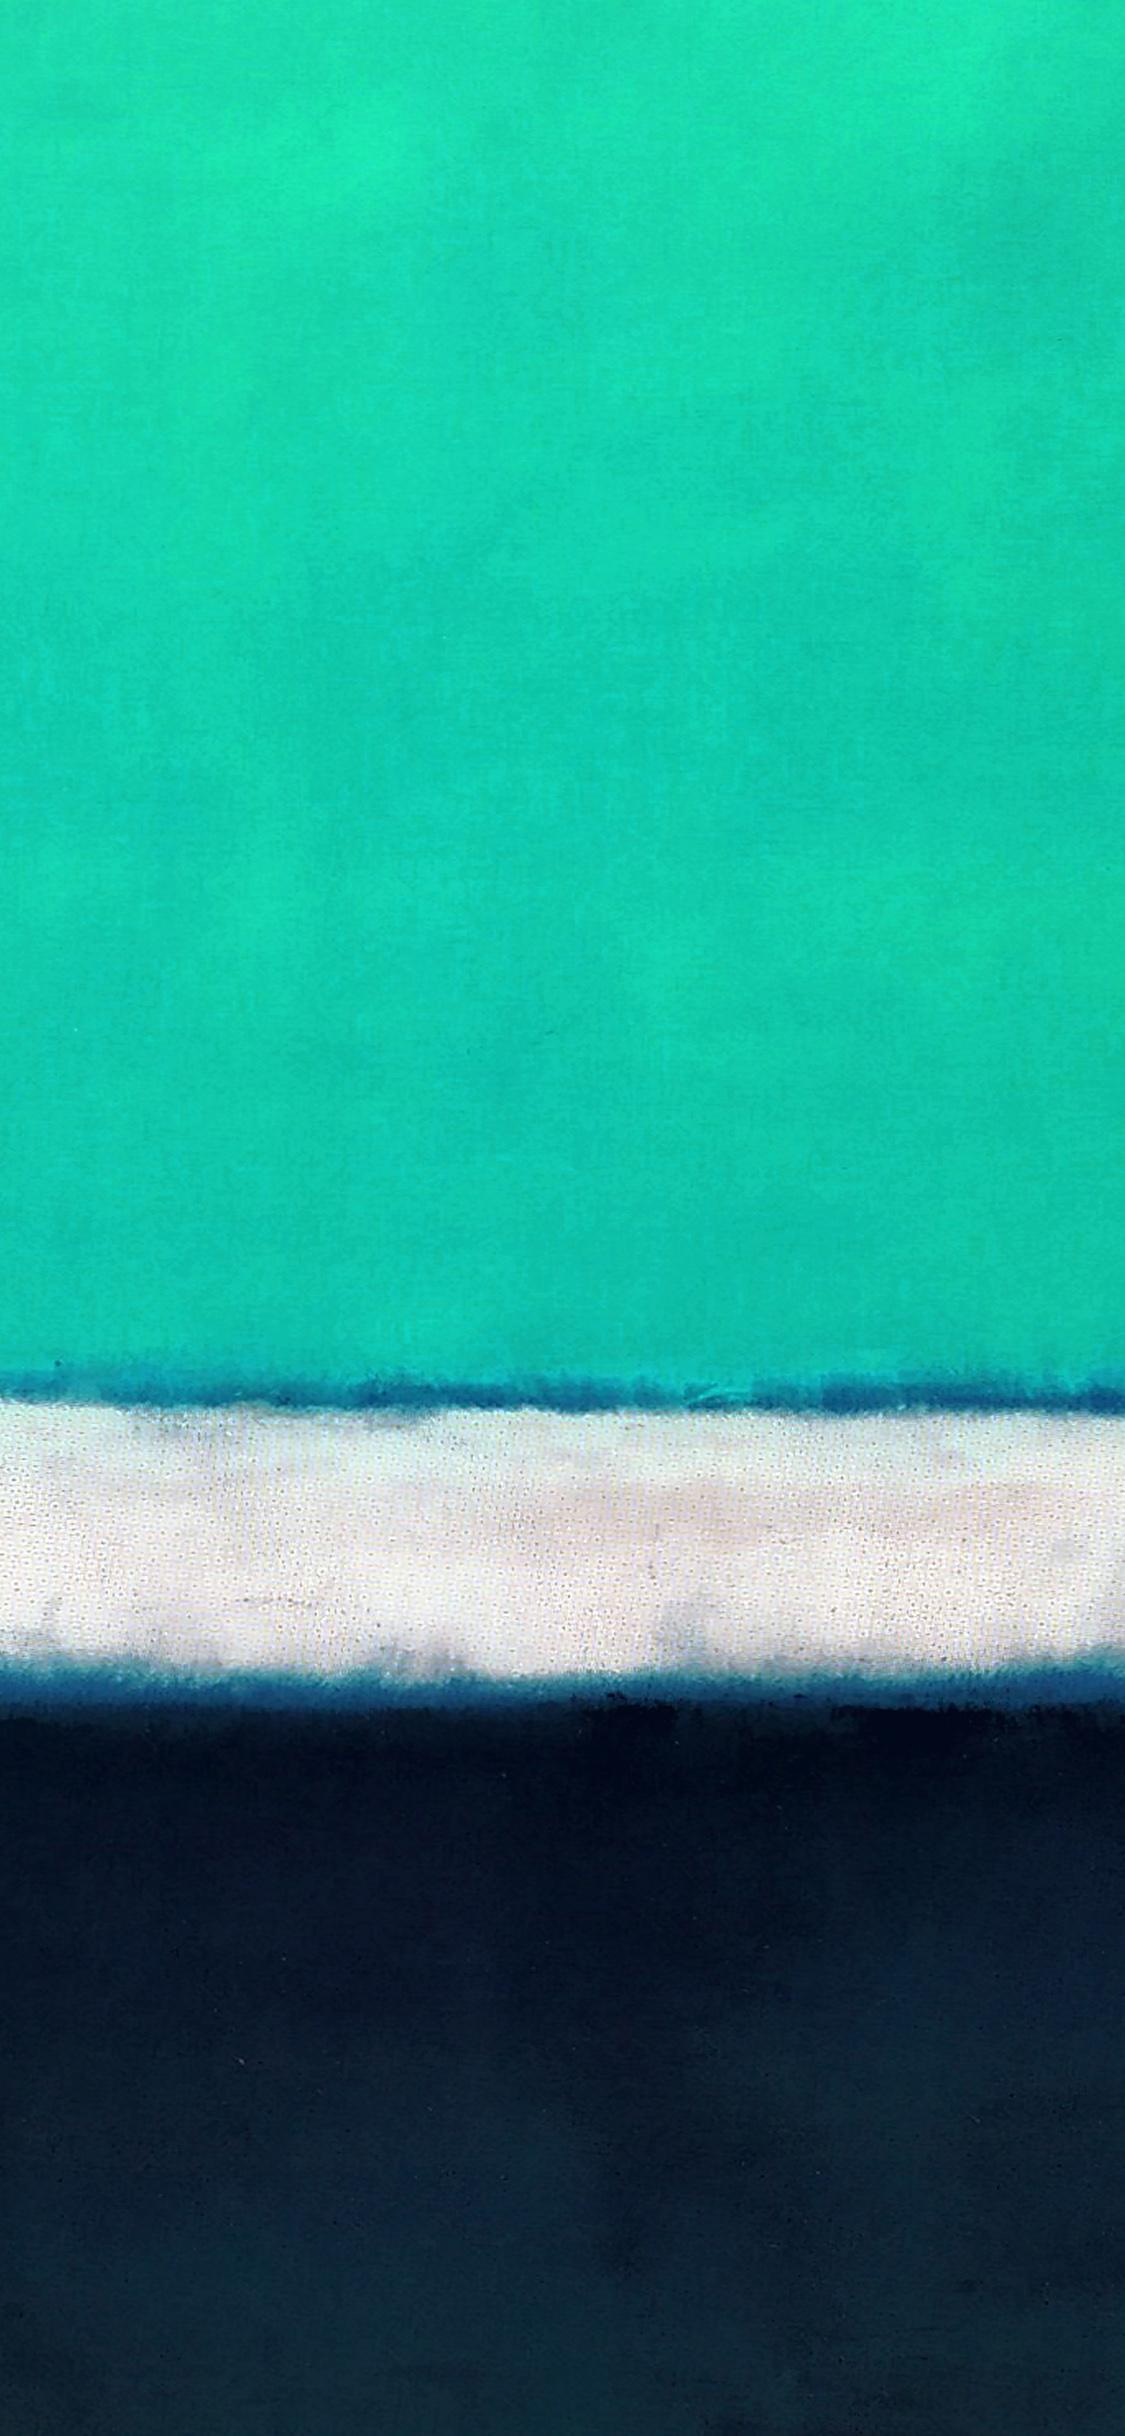 iPhonexpapers.com-Apple-iPhone-wallpaper-al69-blue-green-rothko-mark-paint-style-art-classic